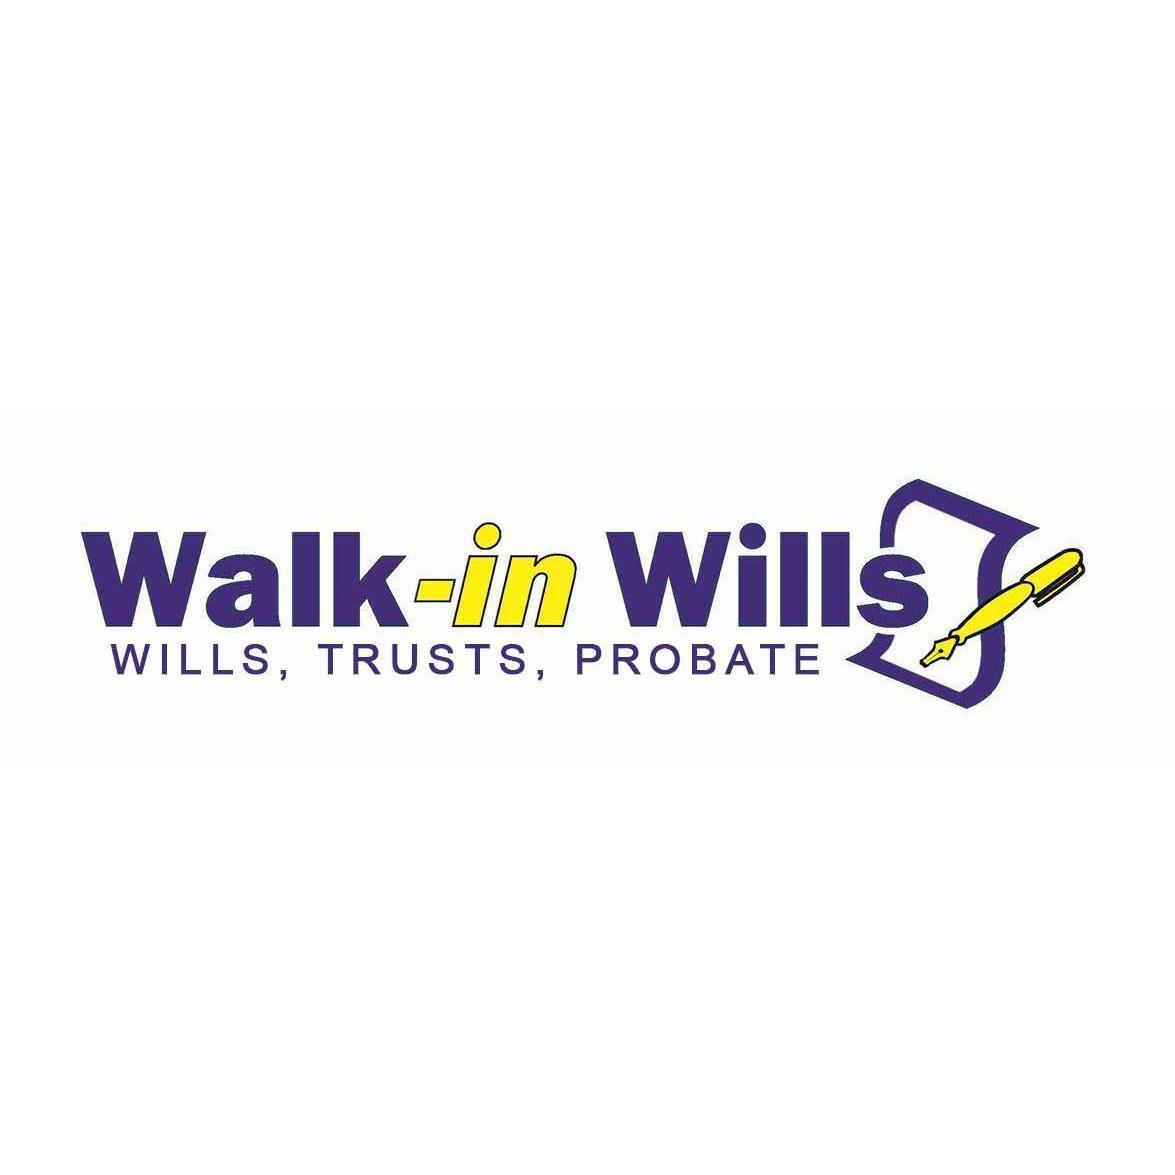 Walk-In Wills Orlando PLLC image 0